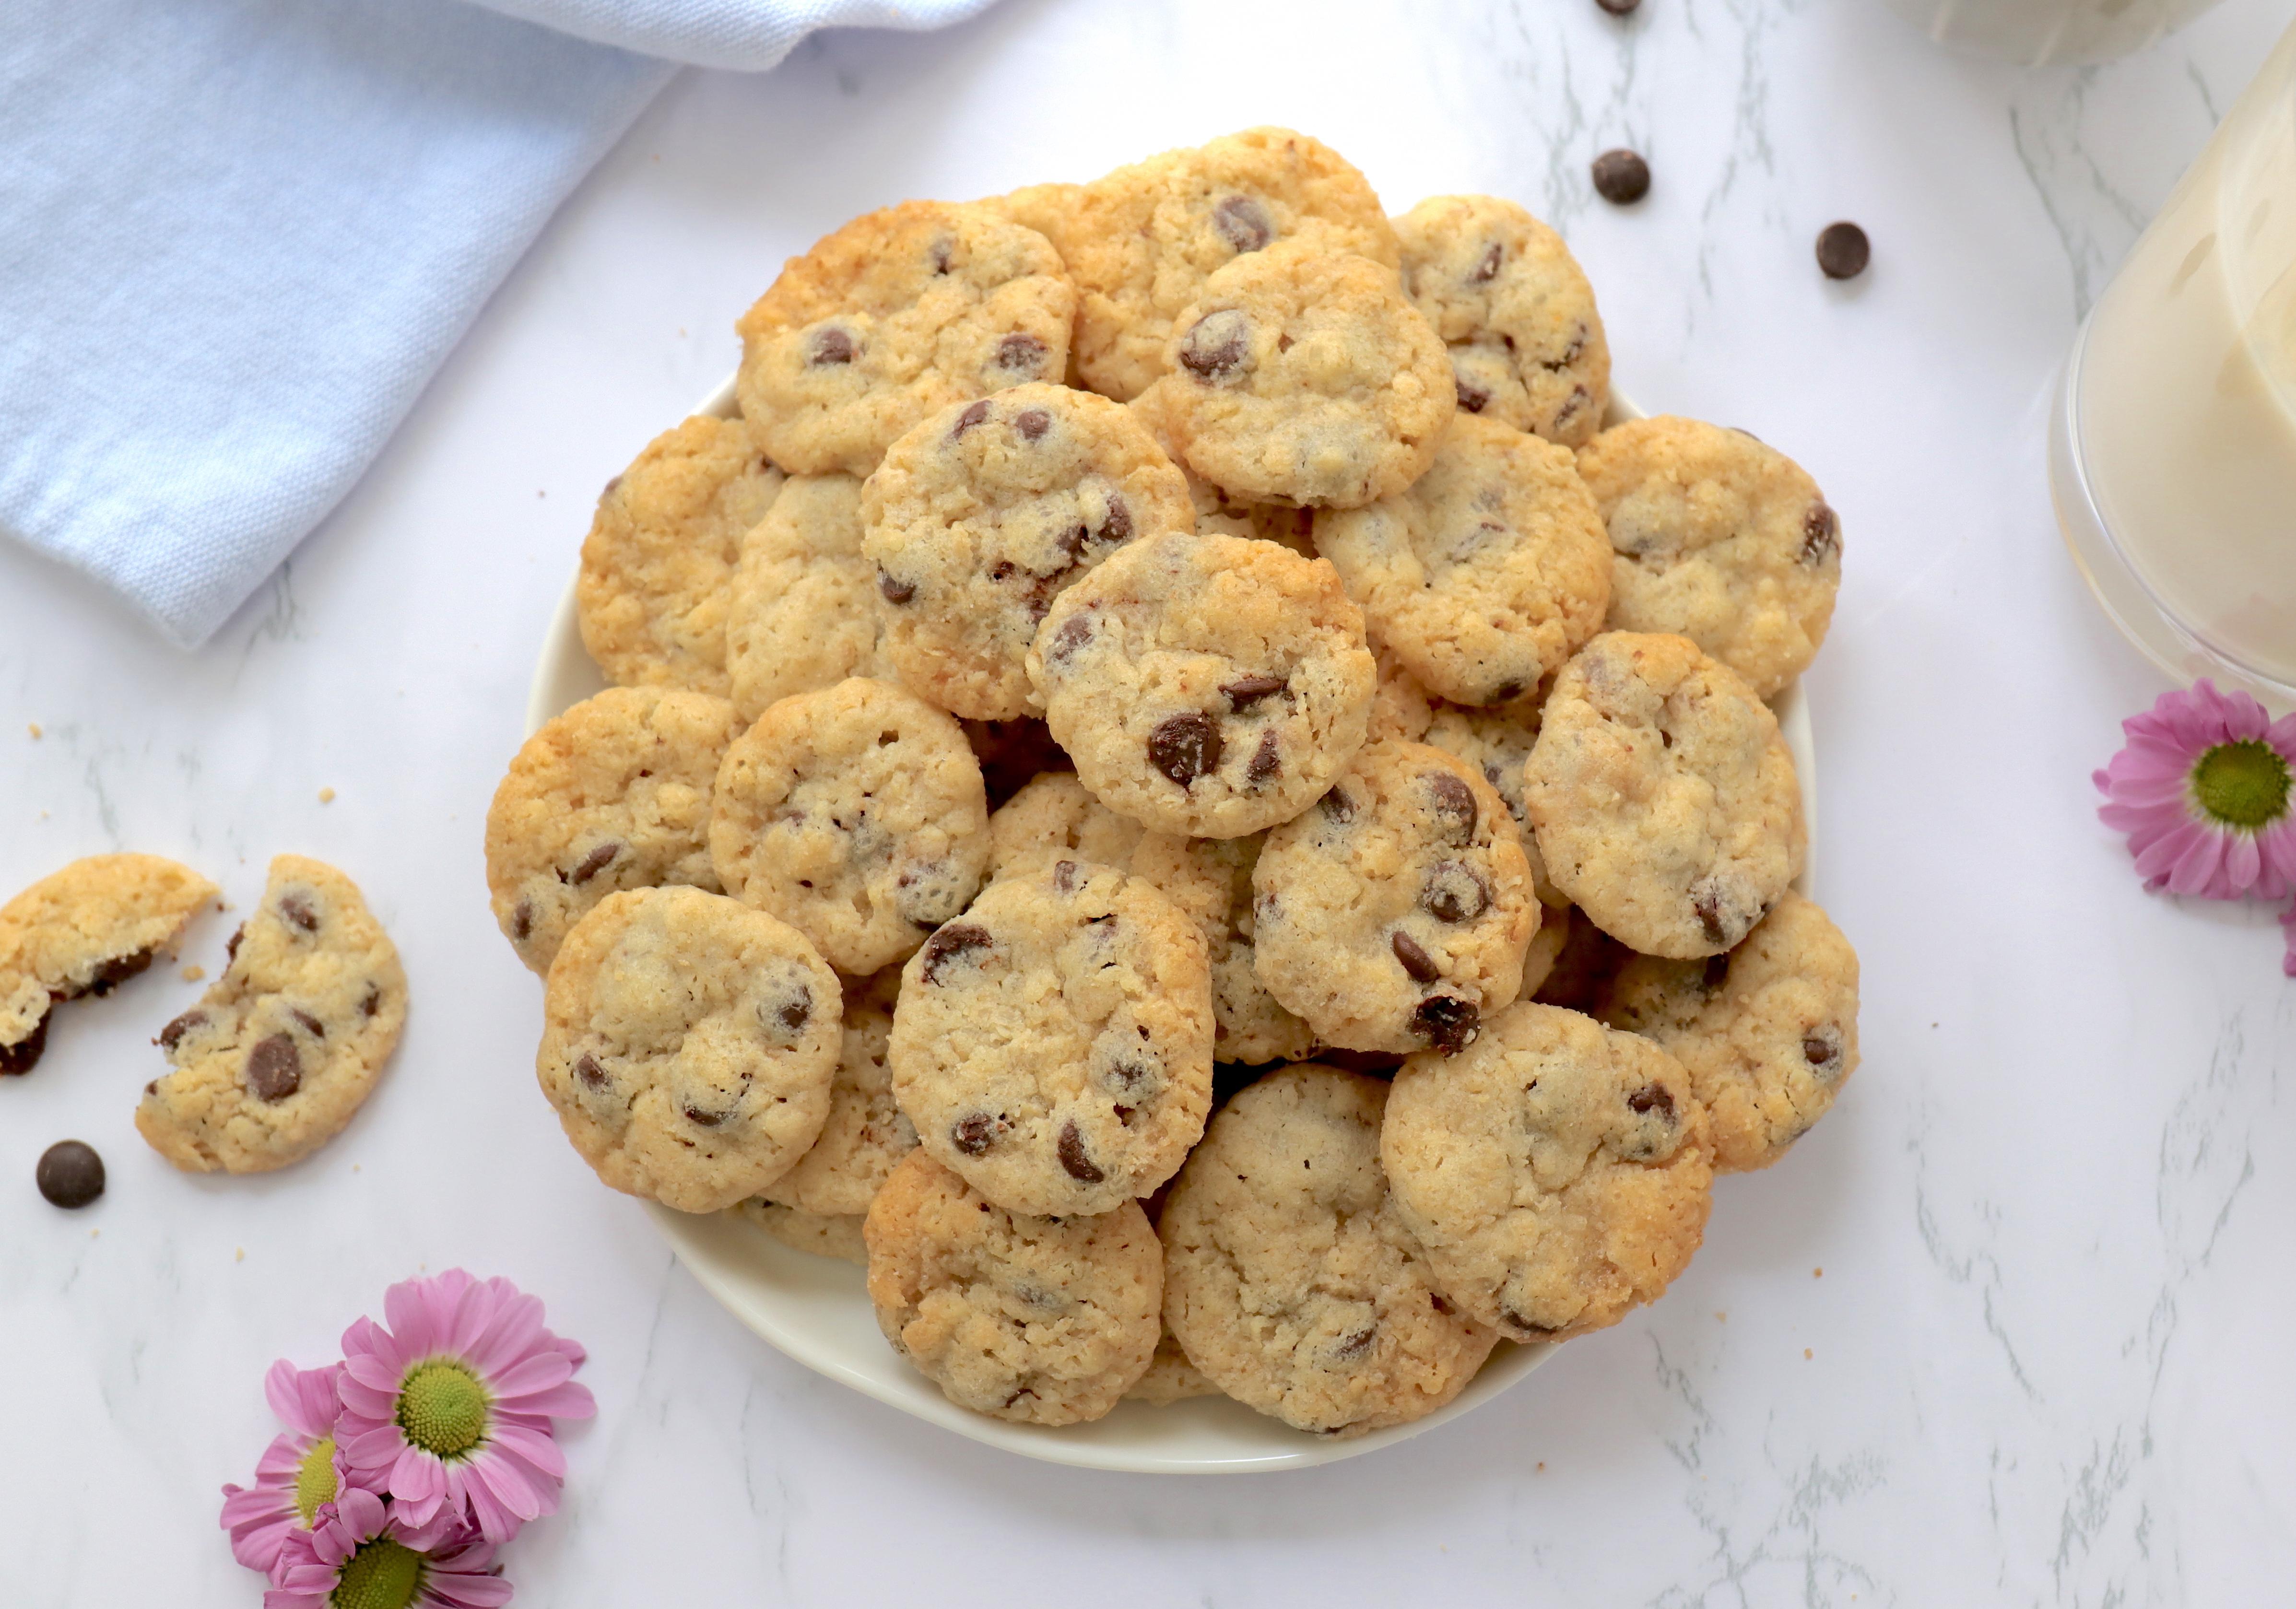 Rezept für Mini Chocolate Chip Cookies to go